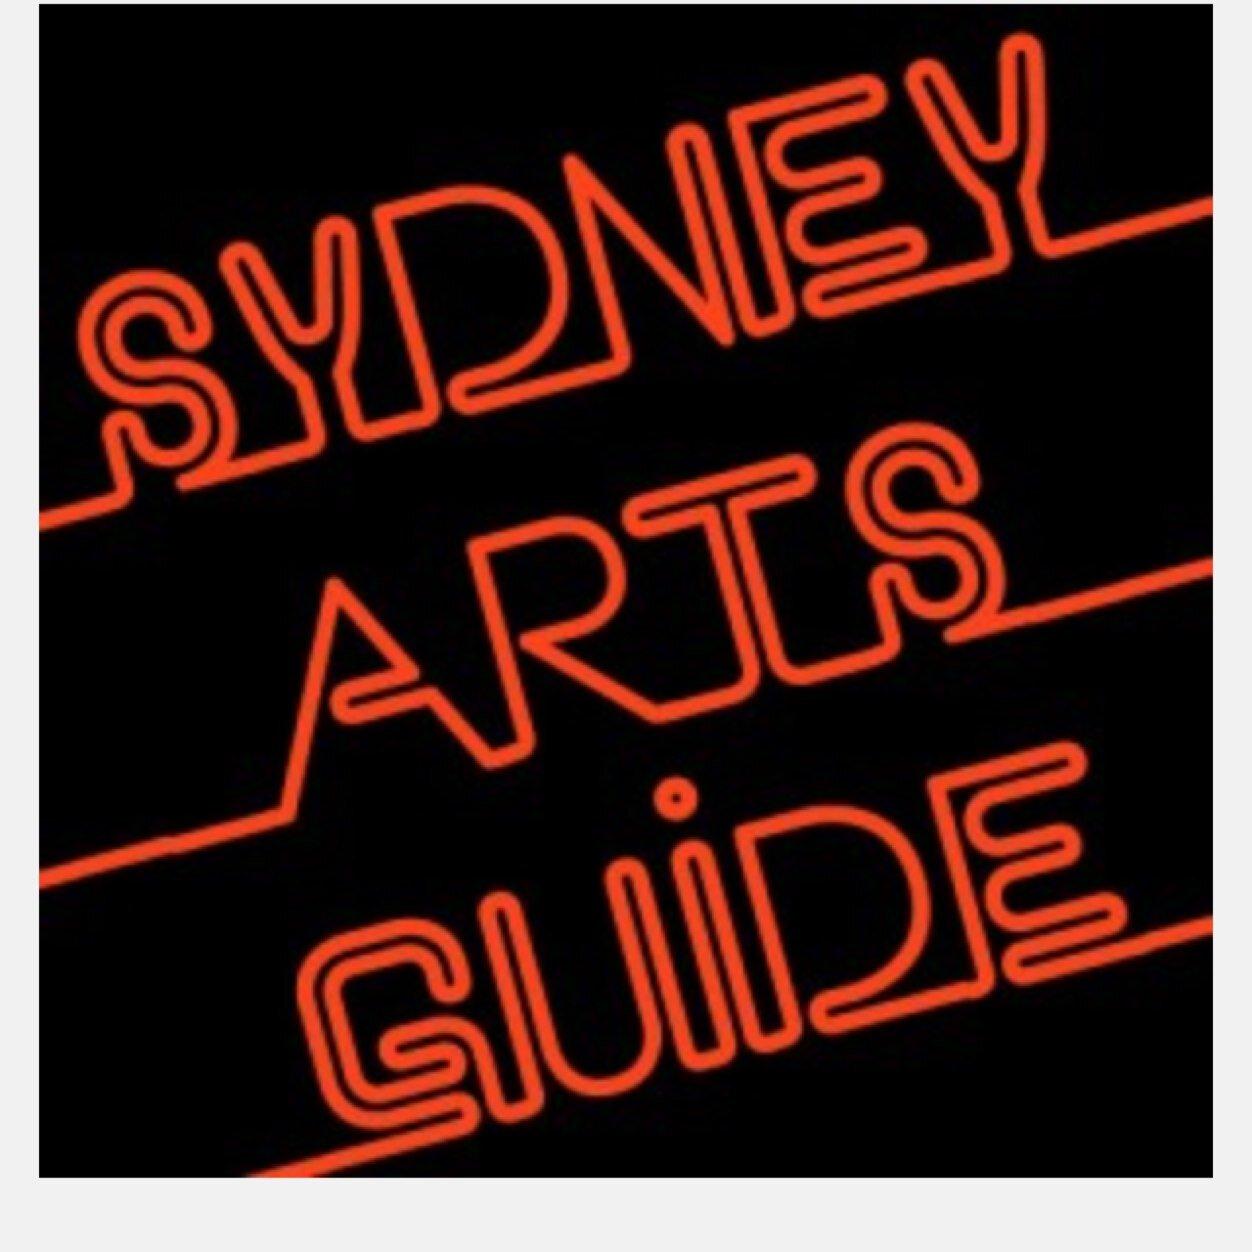 sydney arts guide sydneyartsguide twitter rh twitter com Sydney New South Wales